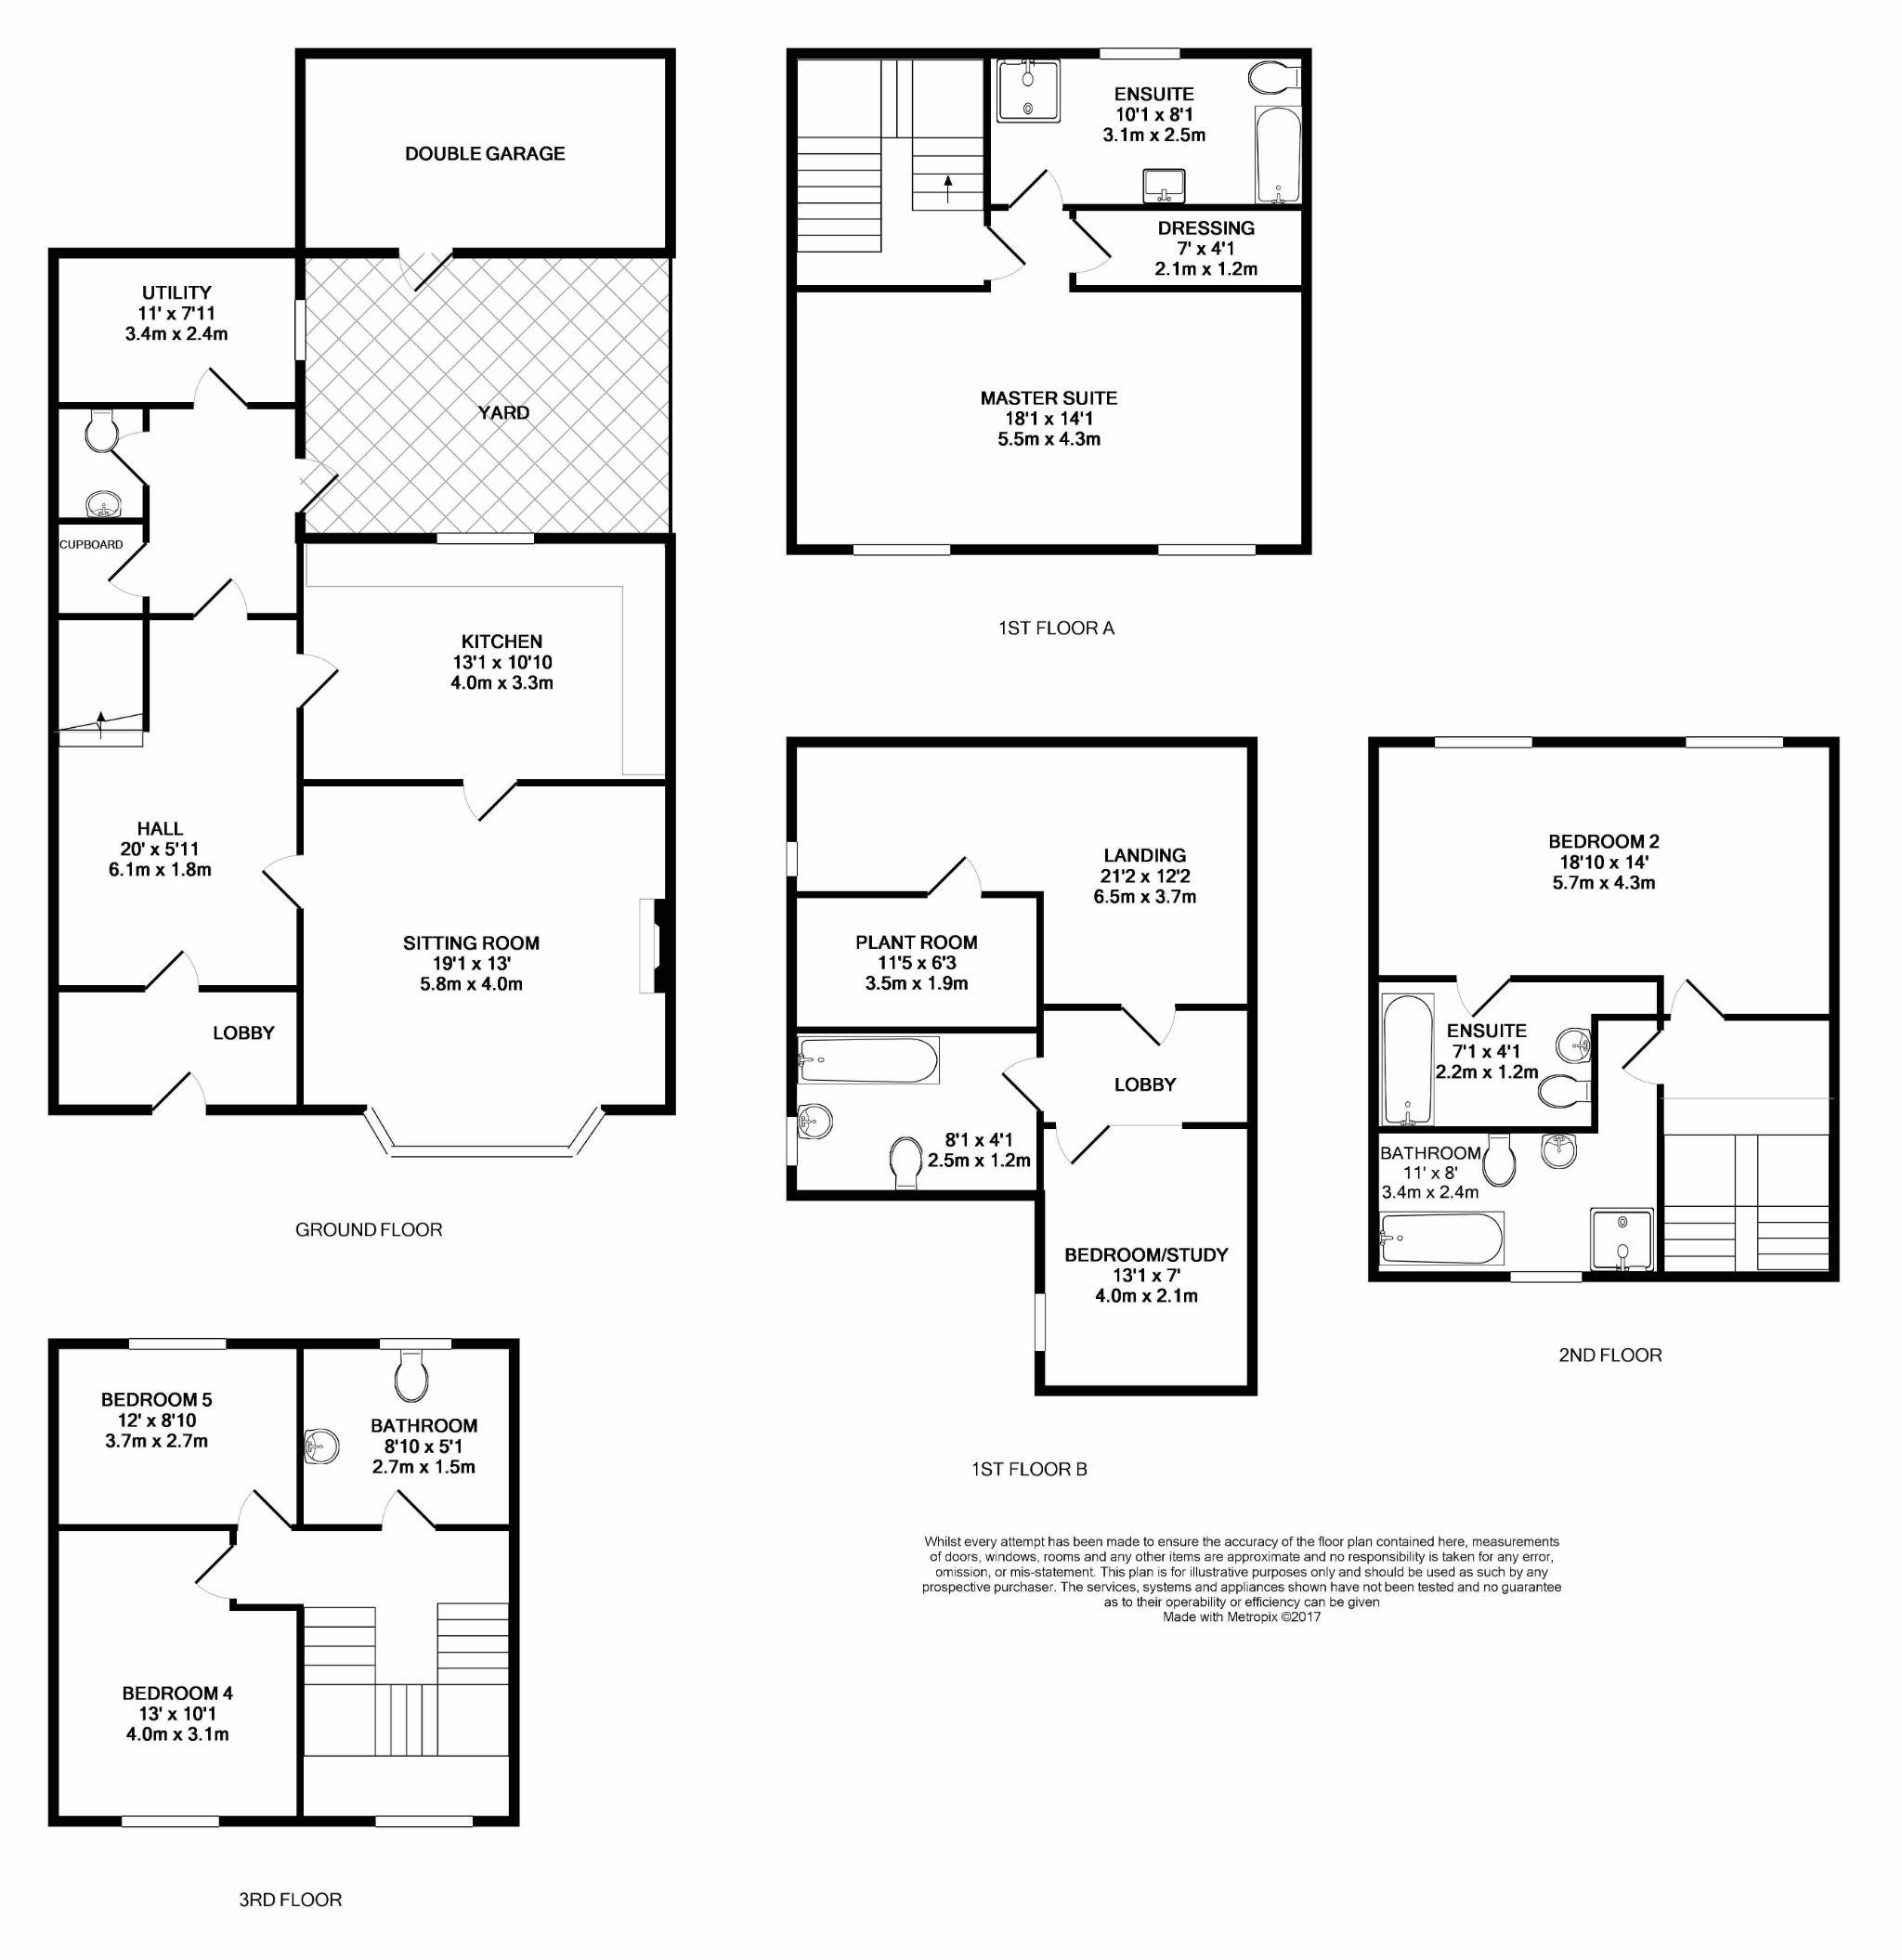 5 bedroom town house For Sale in Douglas - Floorplan 1